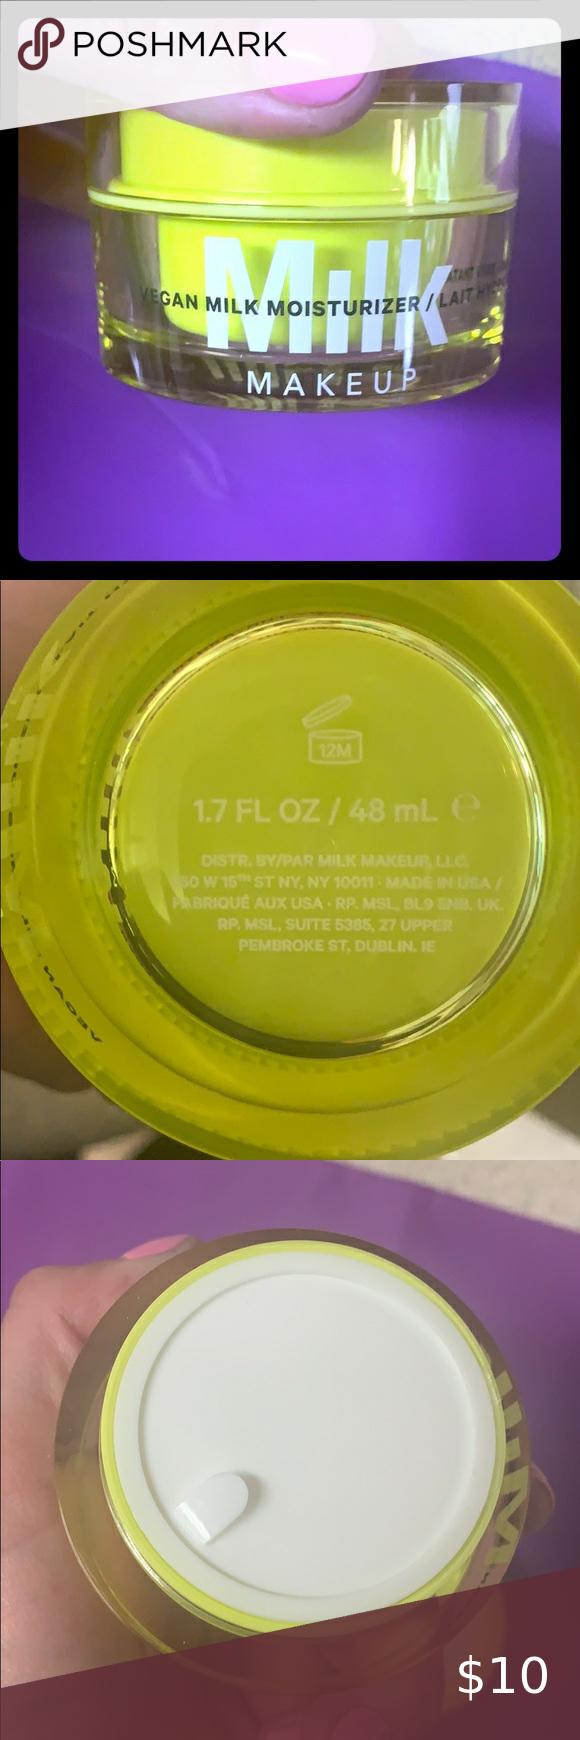 Milk make up vegan moisturizer in 2020 Vegan moisturizer